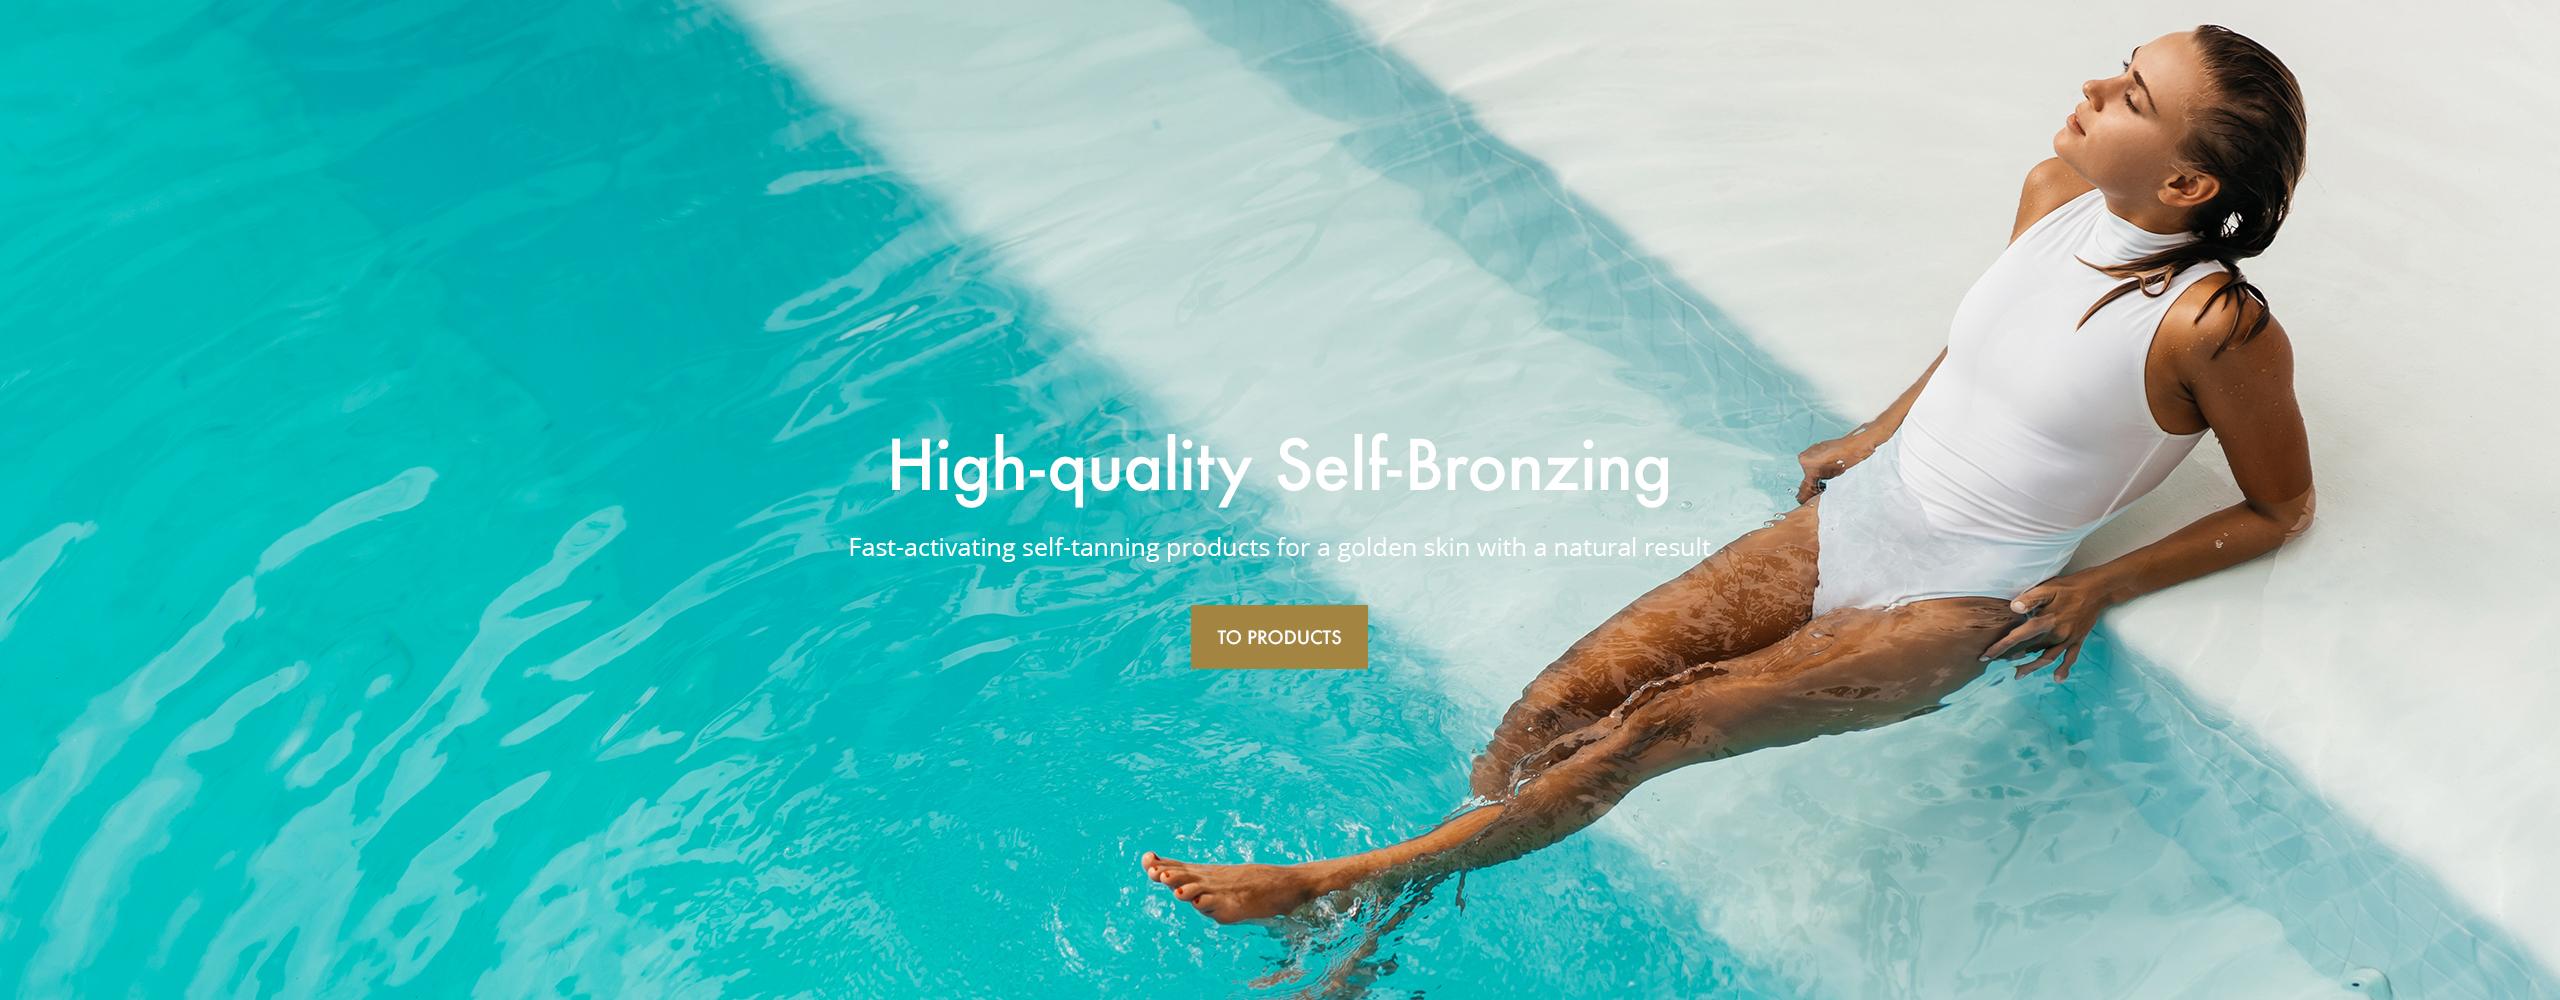 https://www.bronza.uk/image/902/pool-girl-header-startsida-bronza_eng.jpg